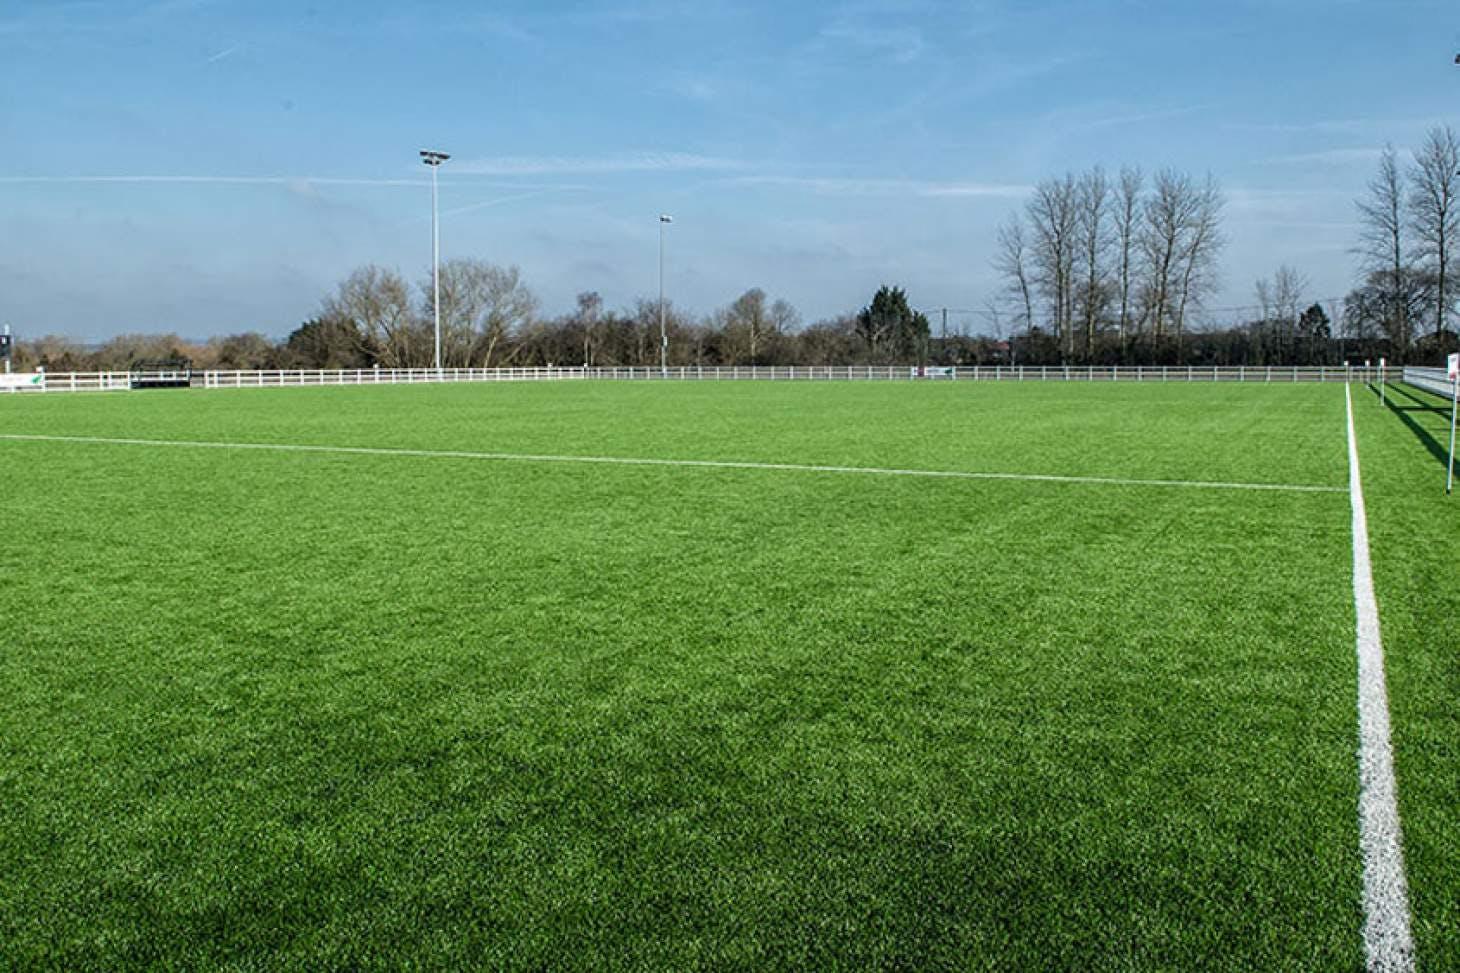 PlayFootball Middlesbrough Billingham 5 a side | 3G Astroturf football pitch